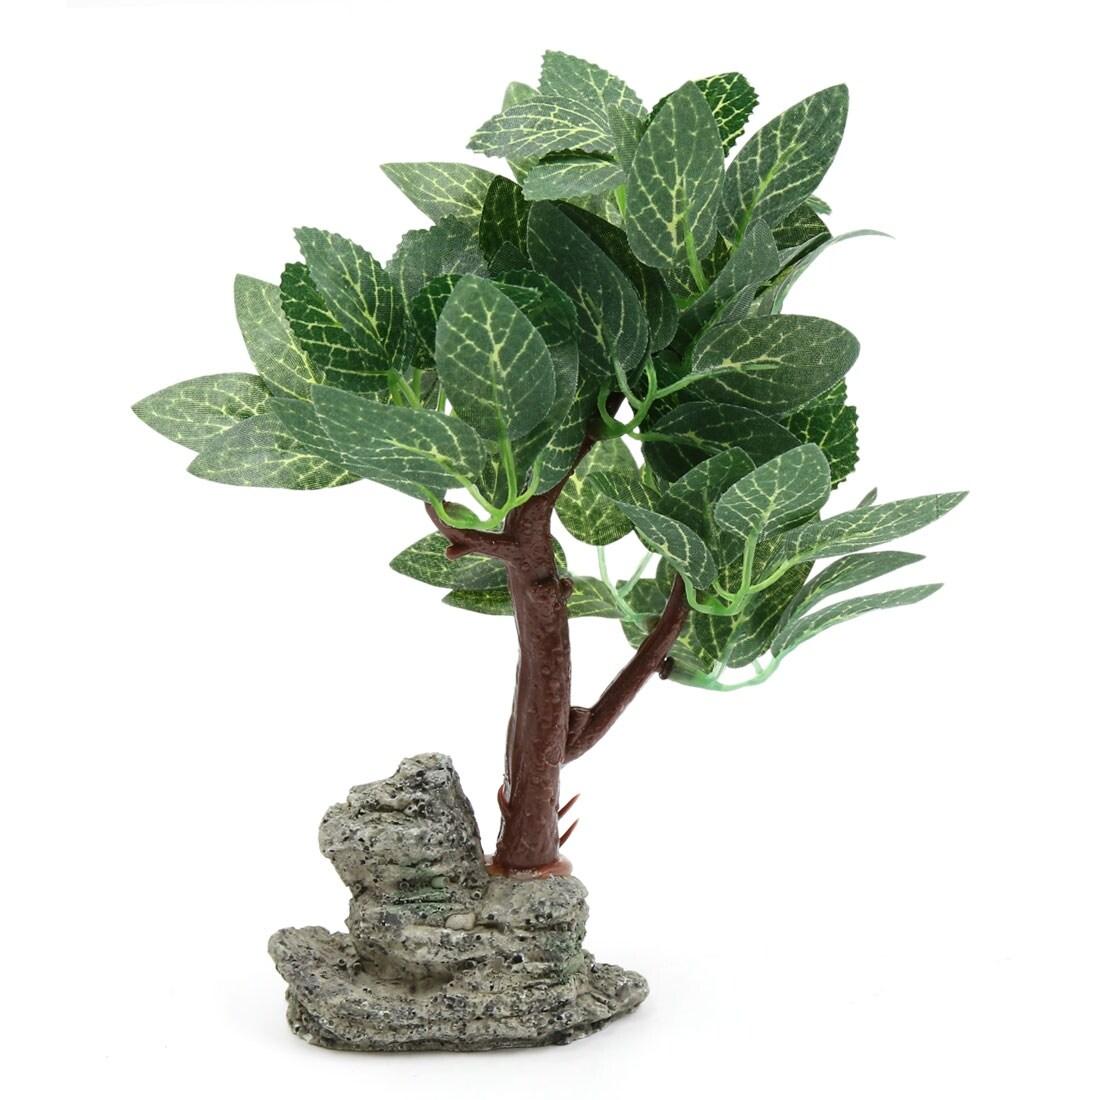 Aquarium Betta Tank Aquascape Lifelike Tree Decor Green W Resin Base Green Middle Size Overstock 24152487